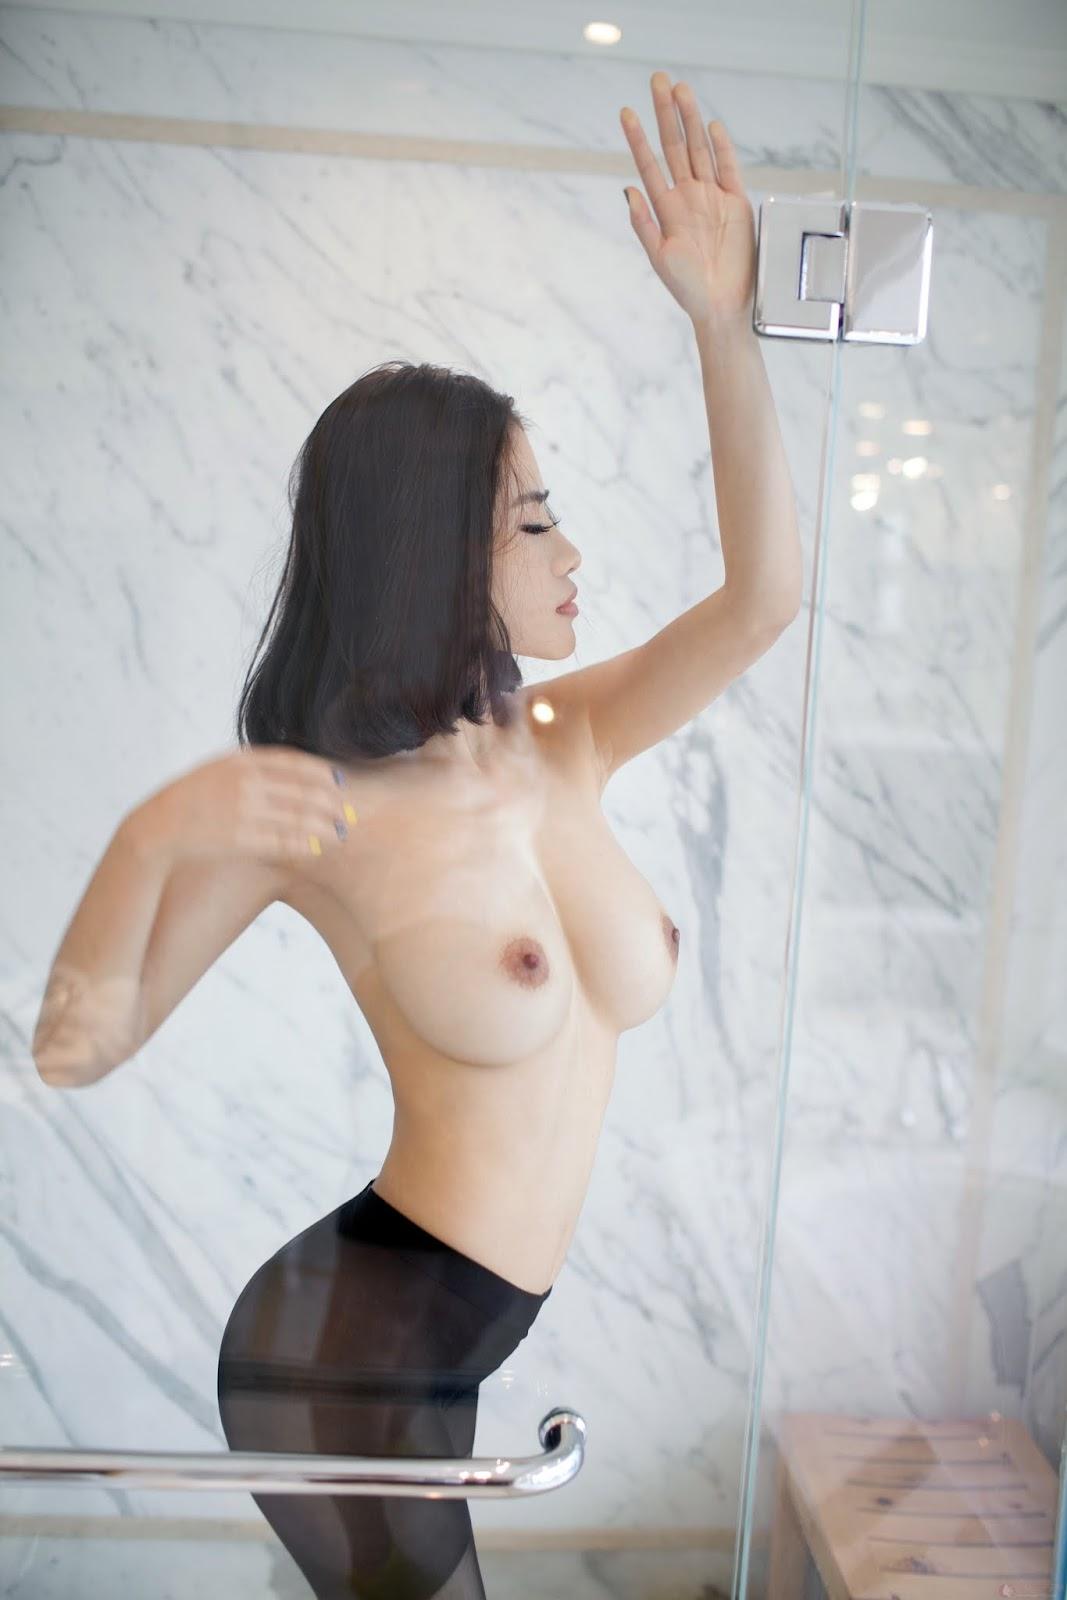 %252B%25C2%25A6%252B%2529%2B%252808%2529 - Hot Girl TUIGIRL NO.53 Sexy